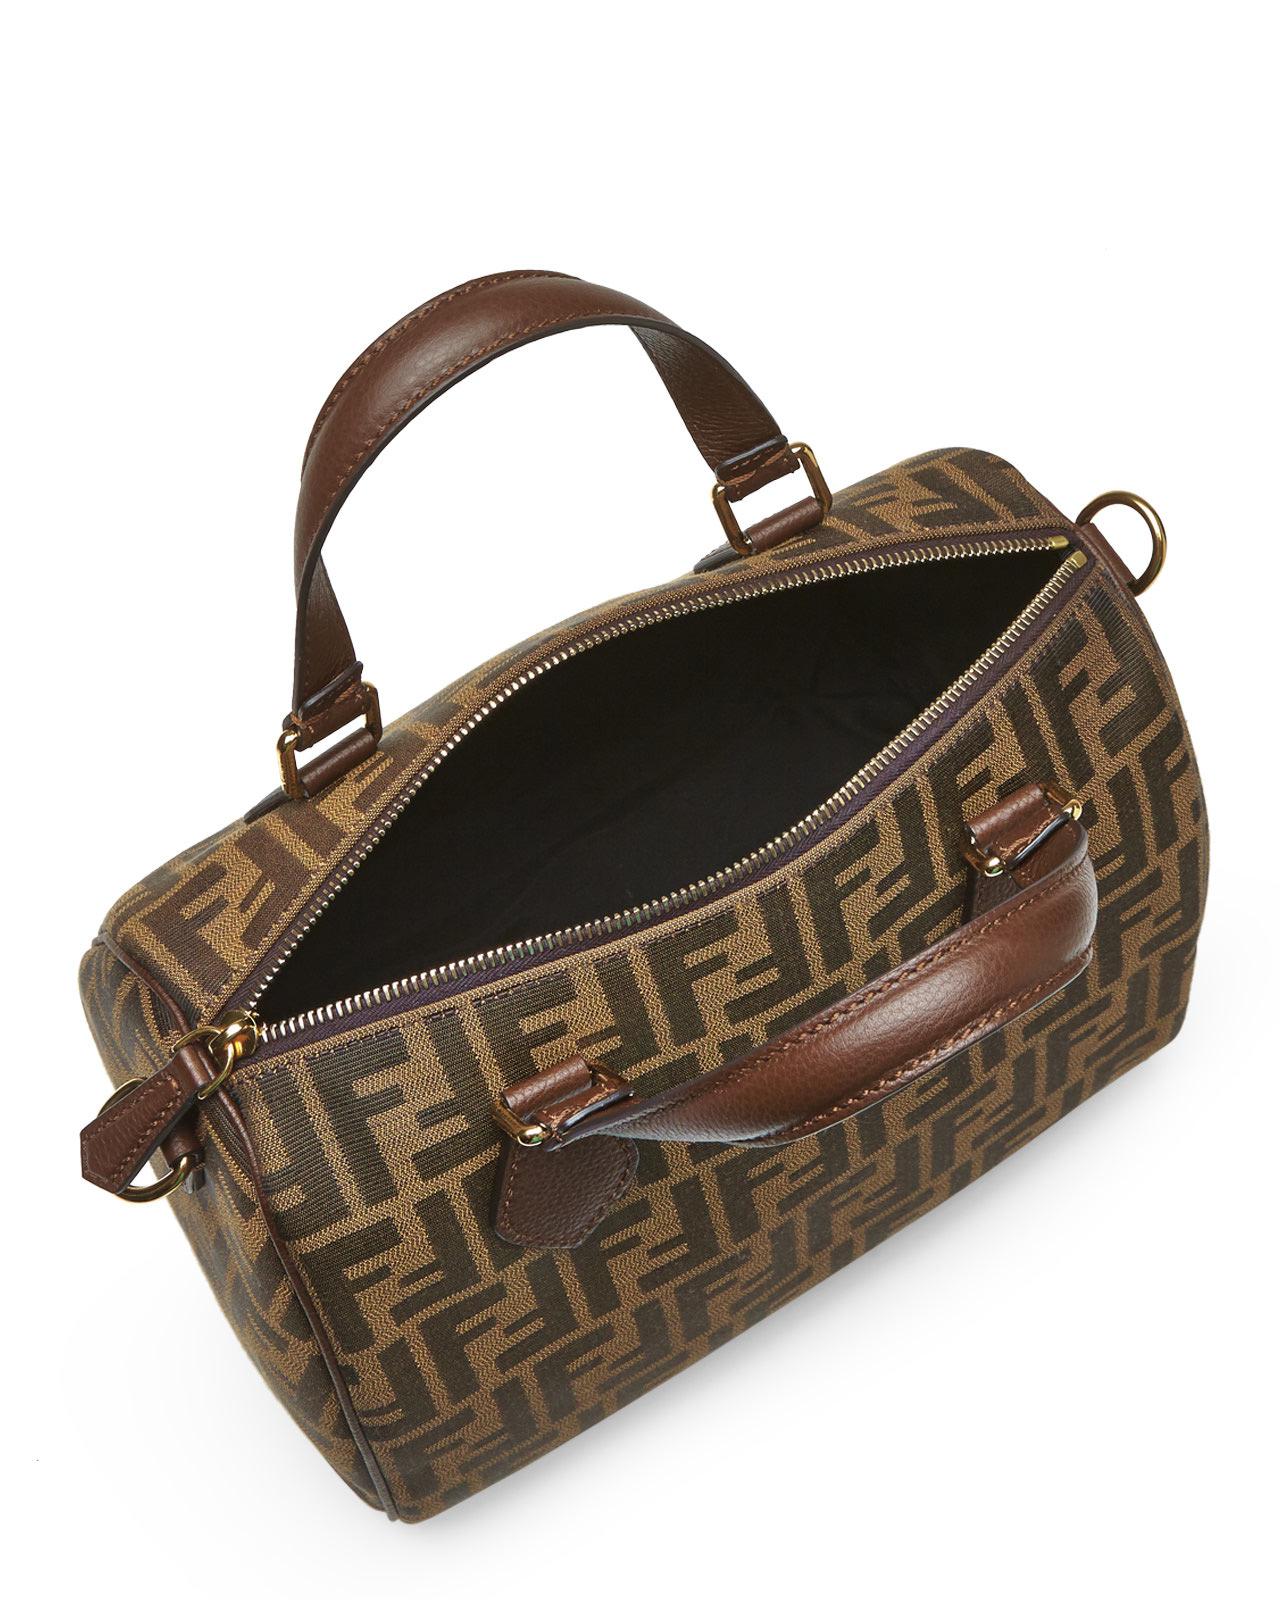 103b7c891684 ... new zealand lyst fendi zucca boston bag in metallic 35732 f9130 ...